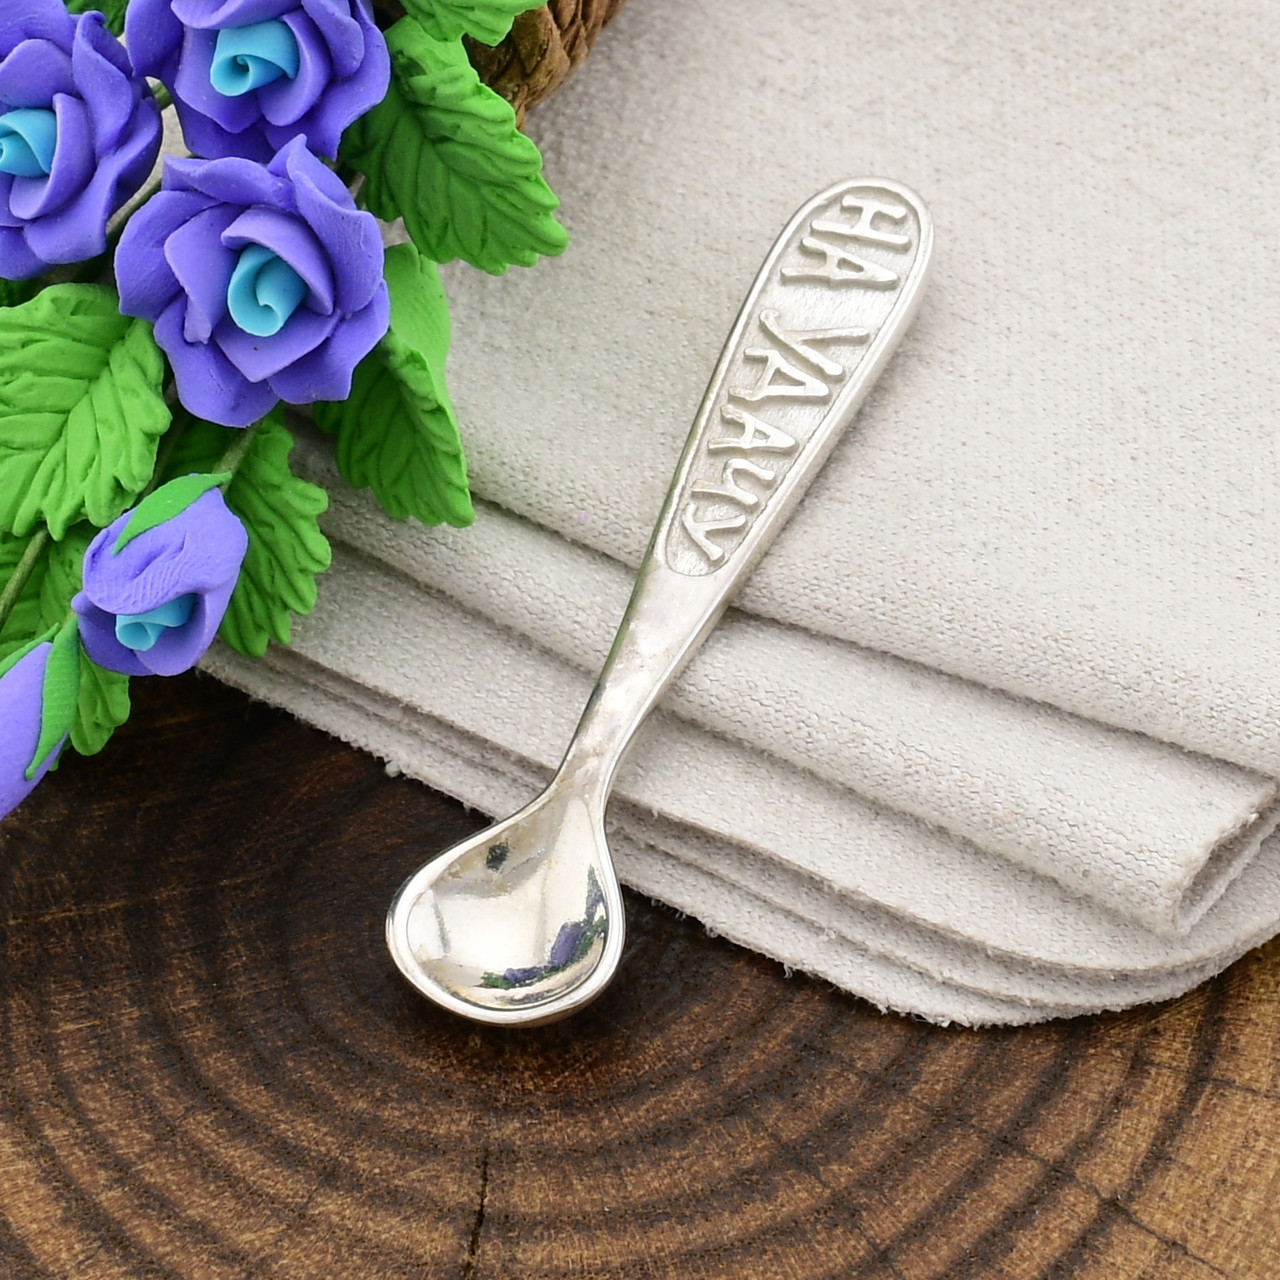 Серебряный сувенир Ложка загребушка на удачу размер 36х8 мм вес 1.95 г